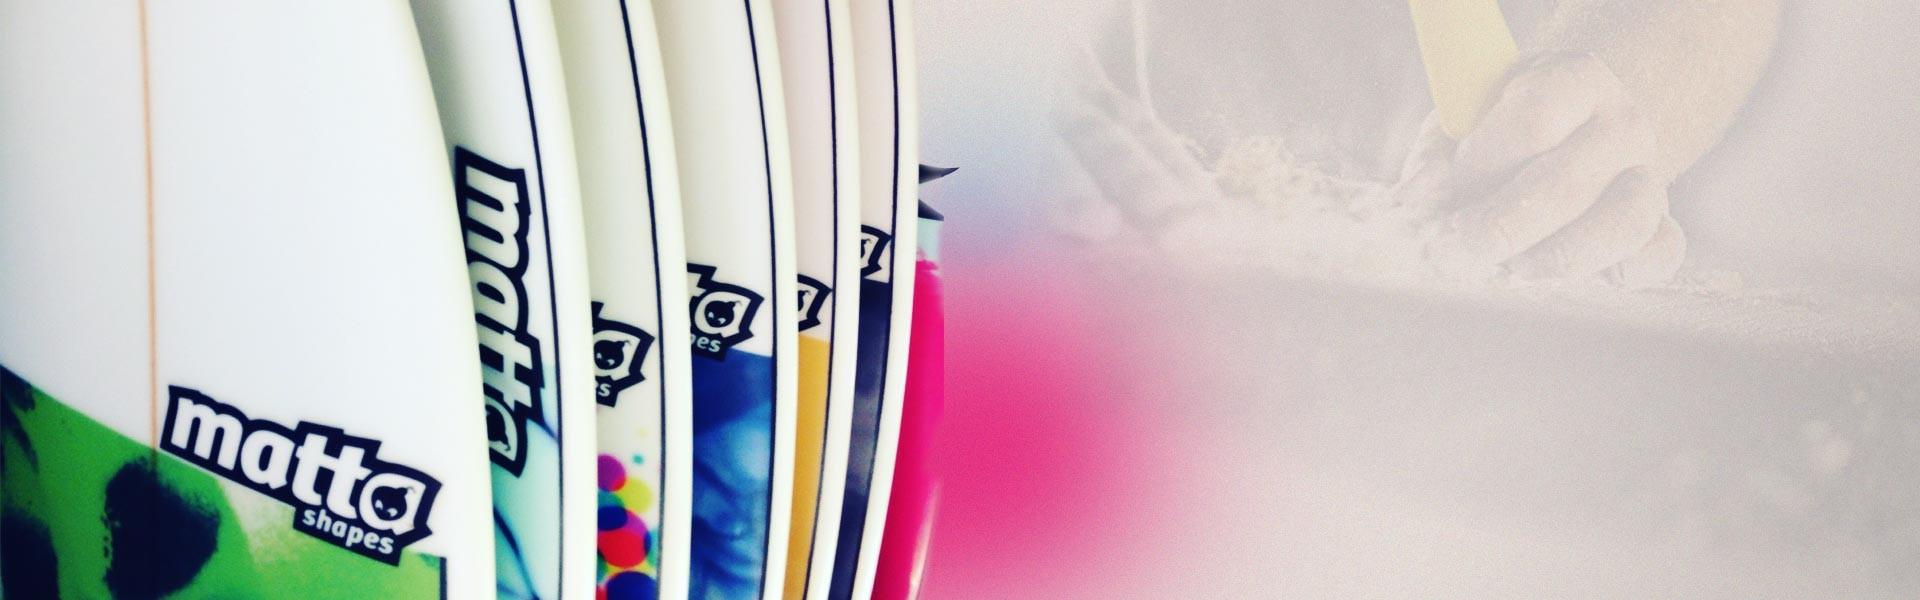 Matta surfboards